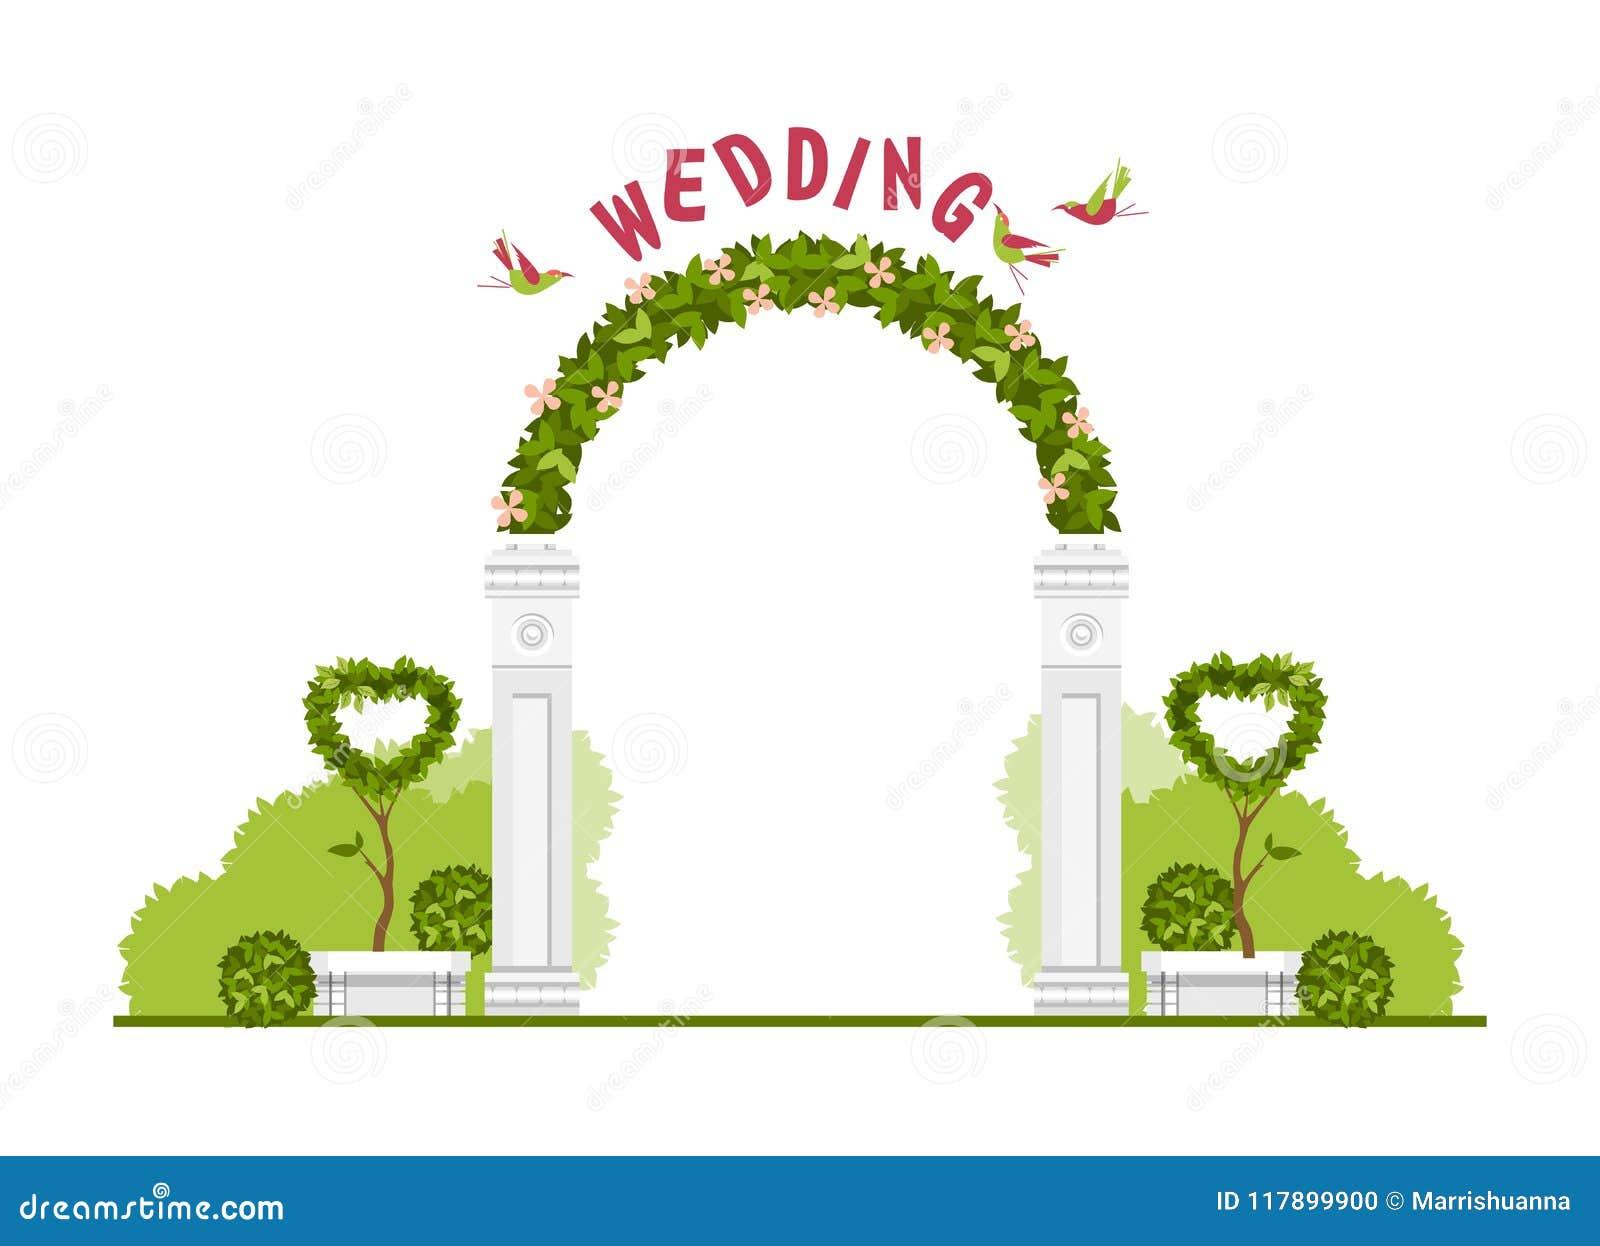 Wedding Arch Vector Stock Vector Illustration Of Grass 117899900